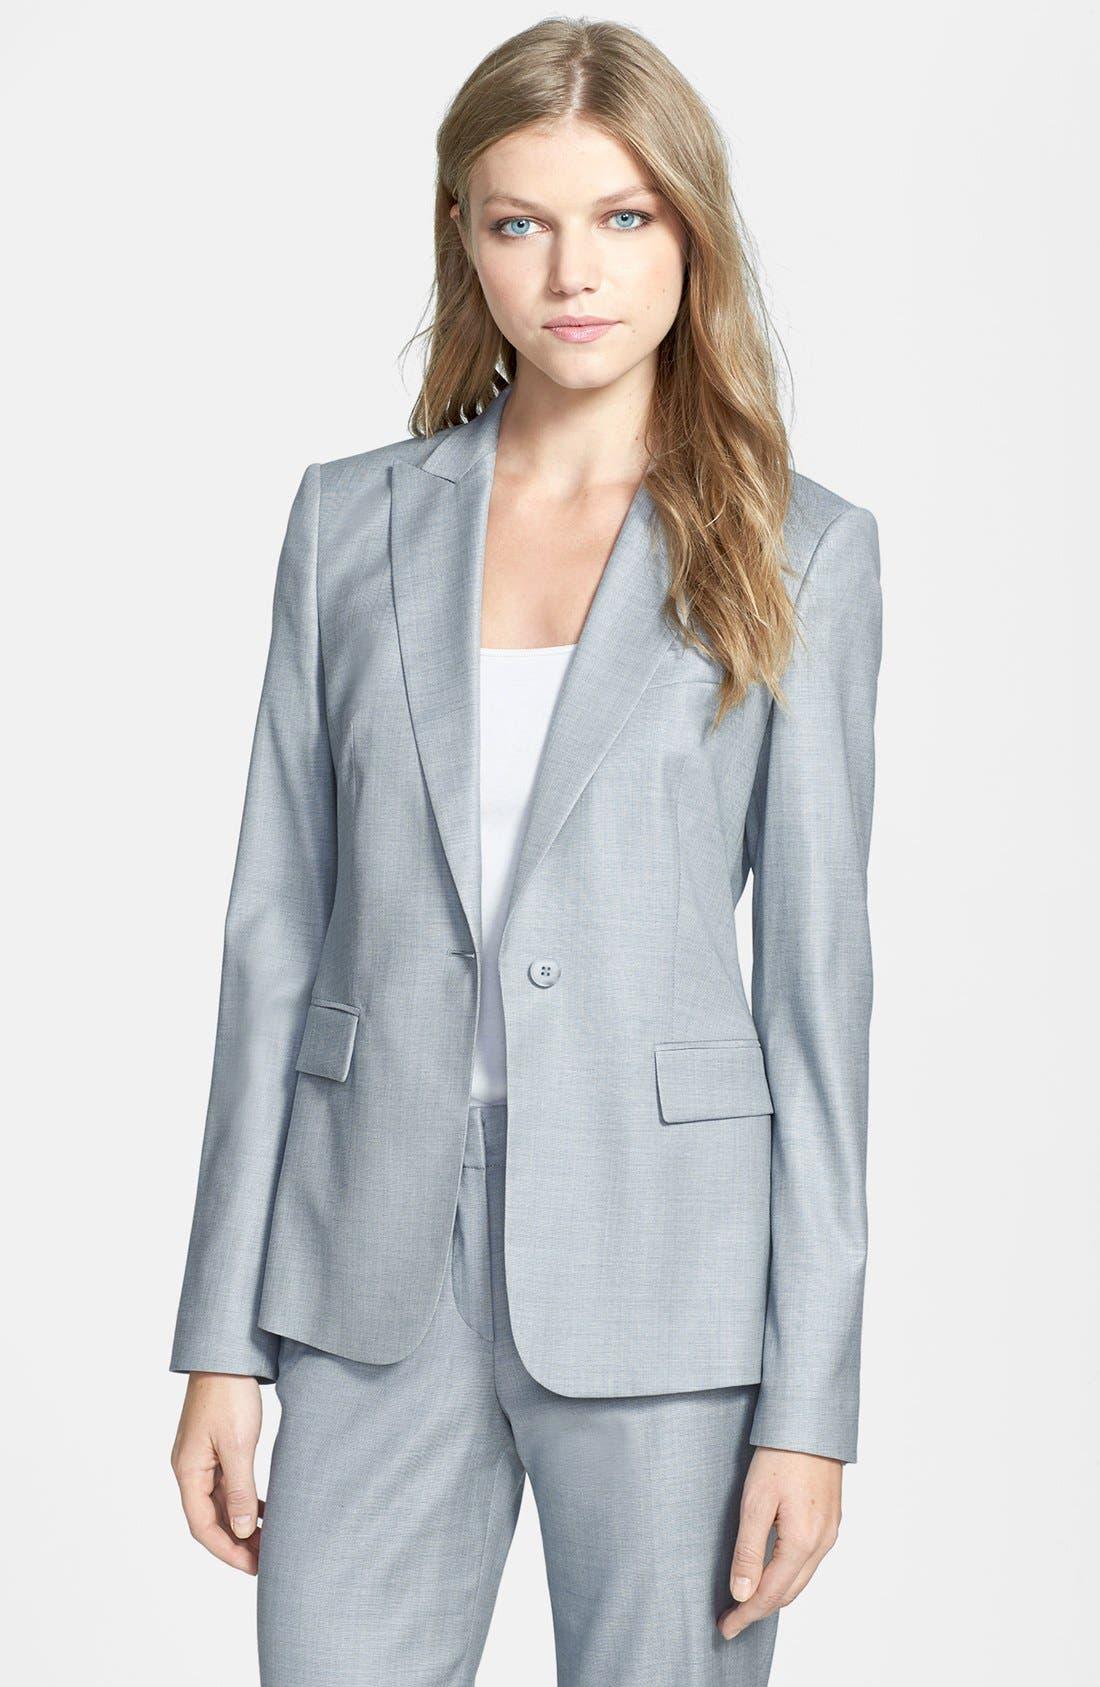 Alternate Image 1 Selected - BOSS HUGO BOSS 'Juicy 6' Stretch Wool Jacket